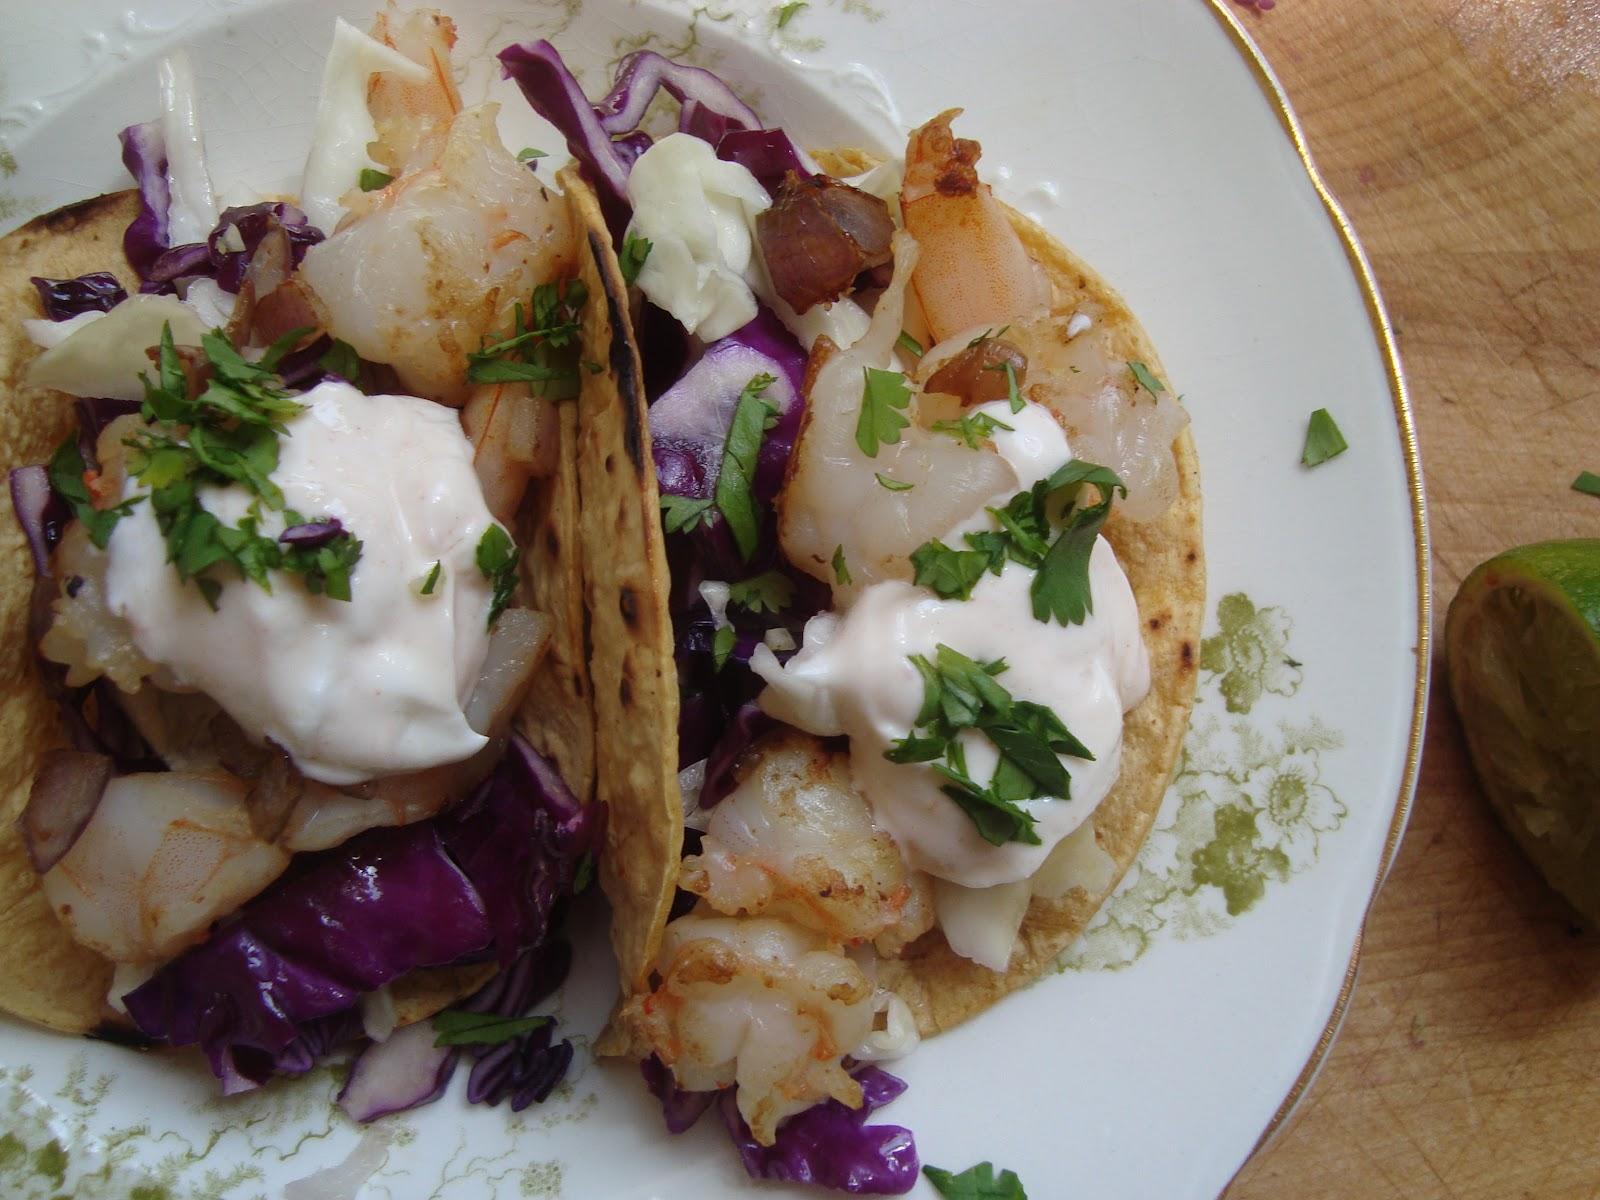 Cooking w Claudine: Cinco De Mayooooo Shrimp Taco